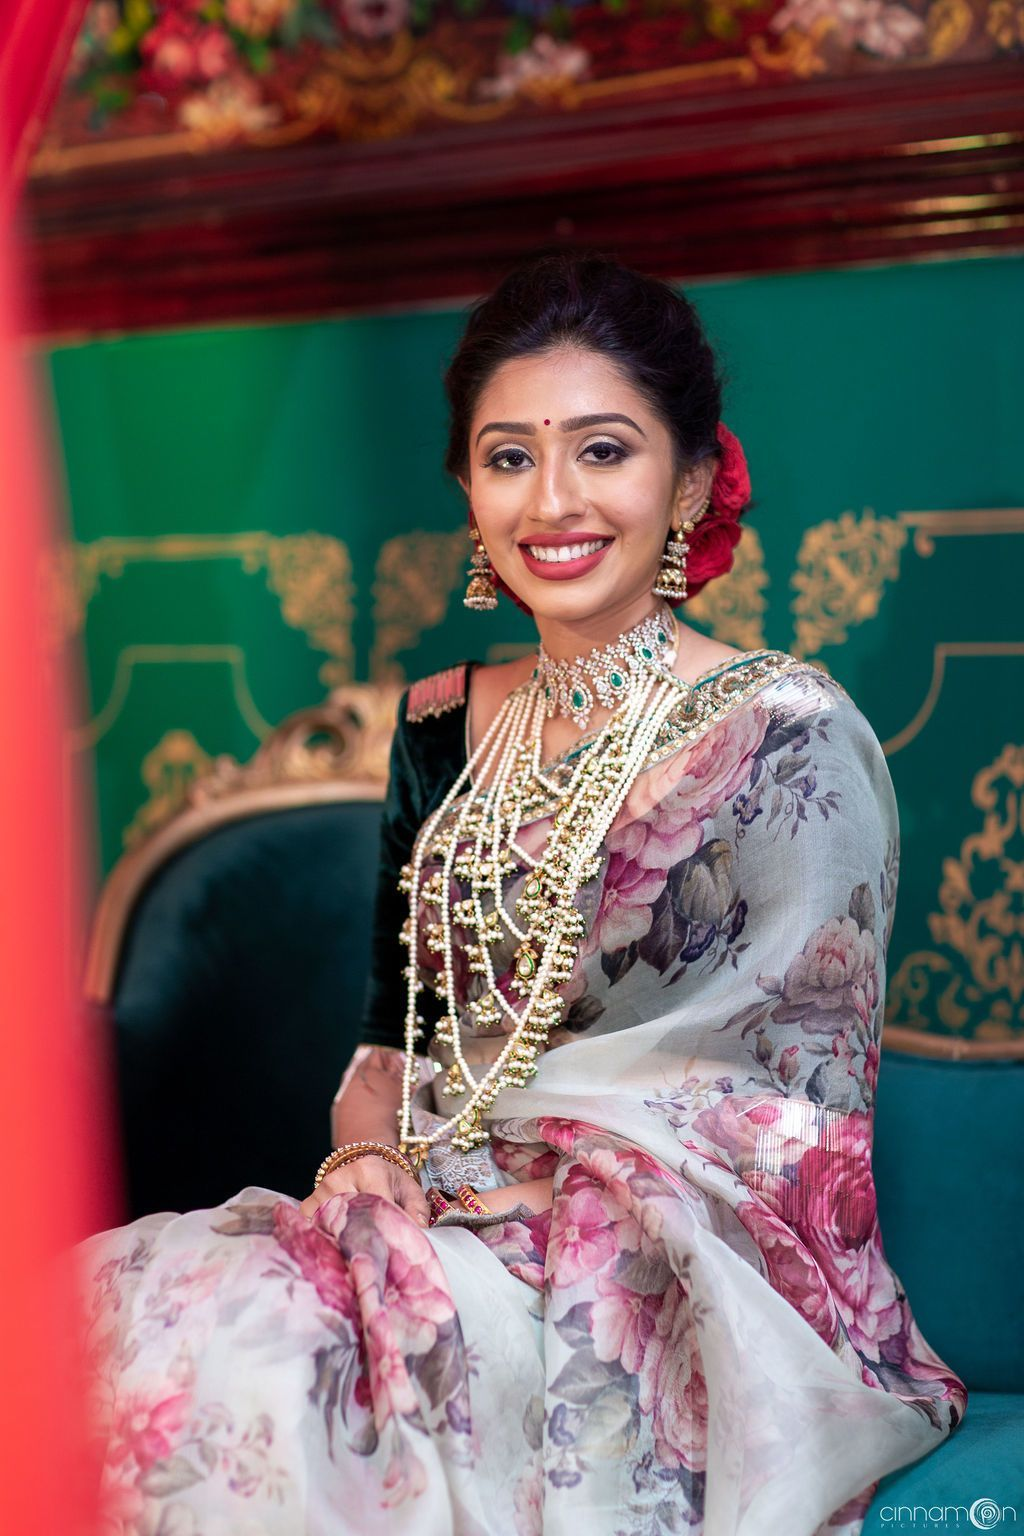 Printed engagement saree